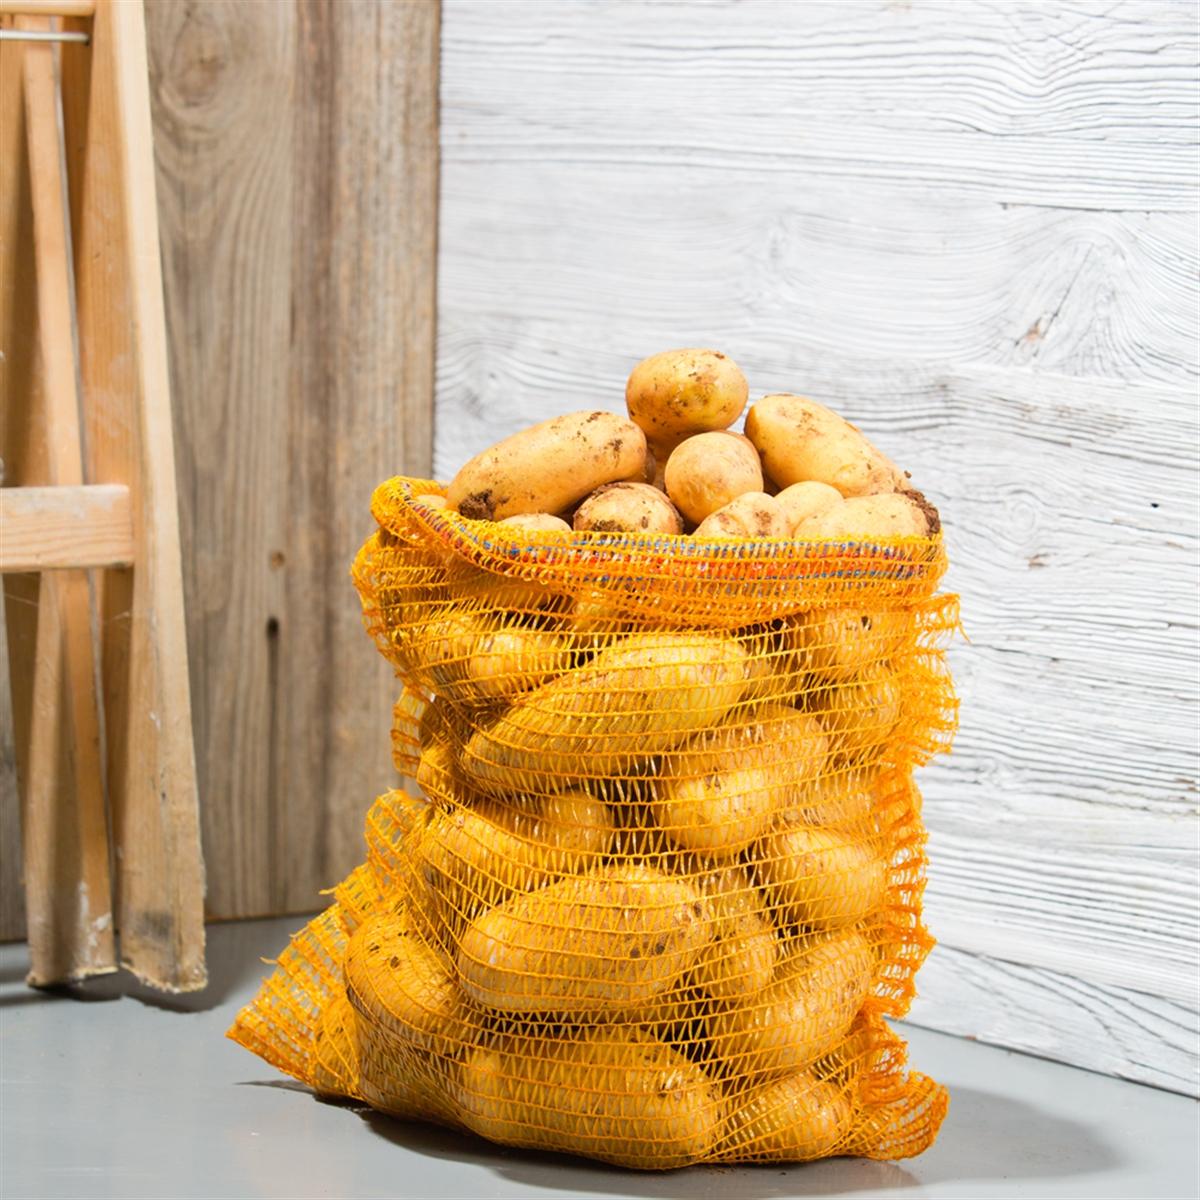 pommes de terre de consommation filet de 10 kg origine france. Black Bedroom Furniture Sets. Home Design Ideas